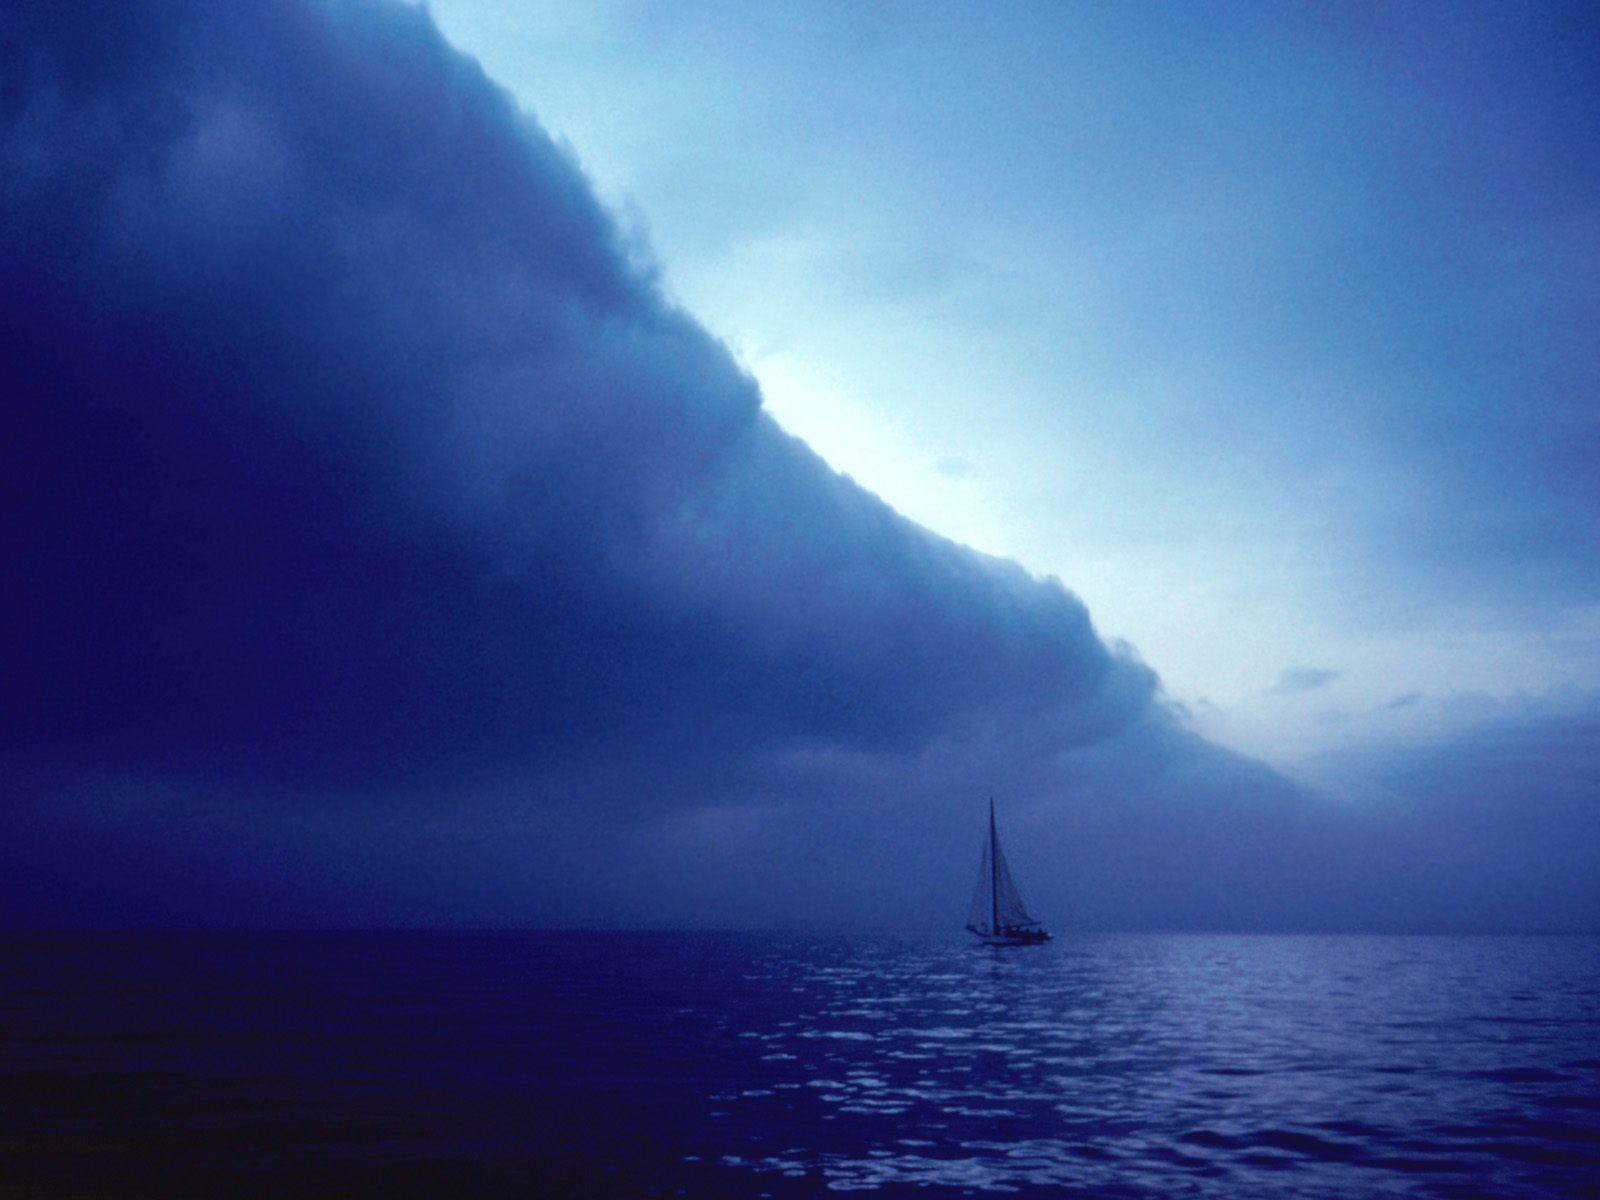 Ominous Storm Front